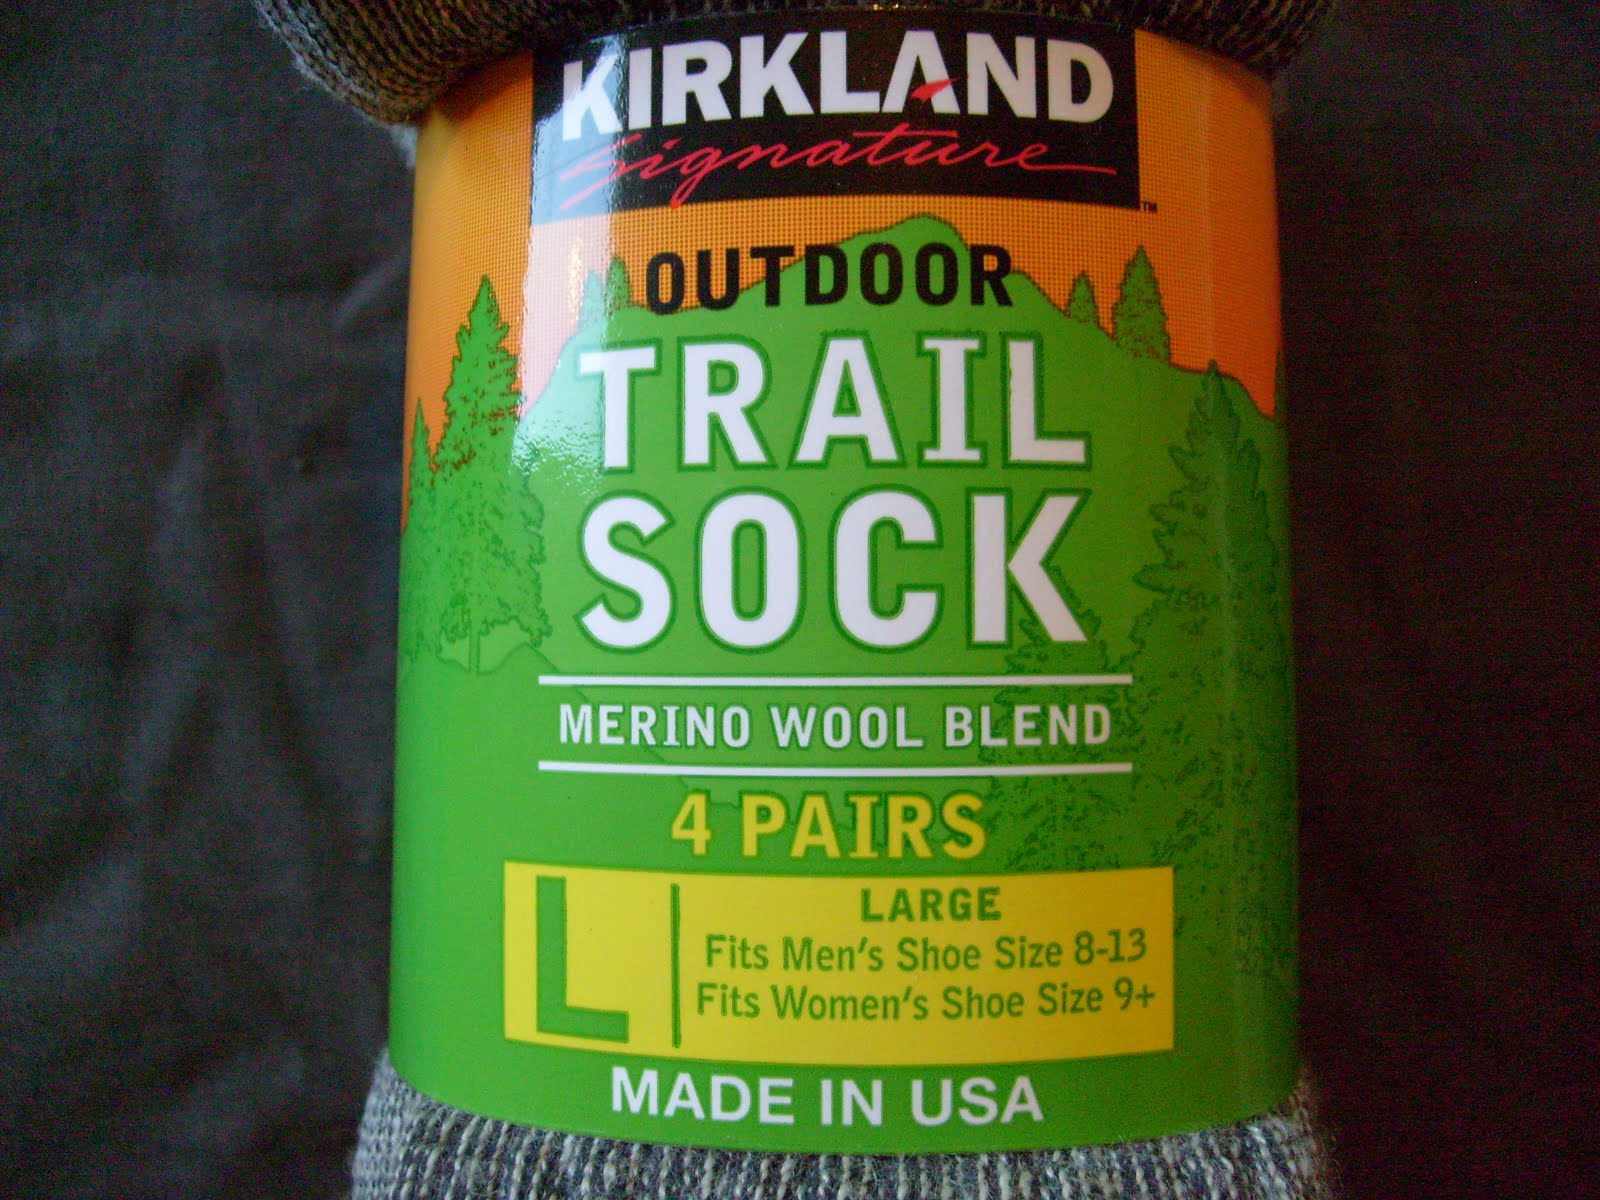 kirkland trail socks images